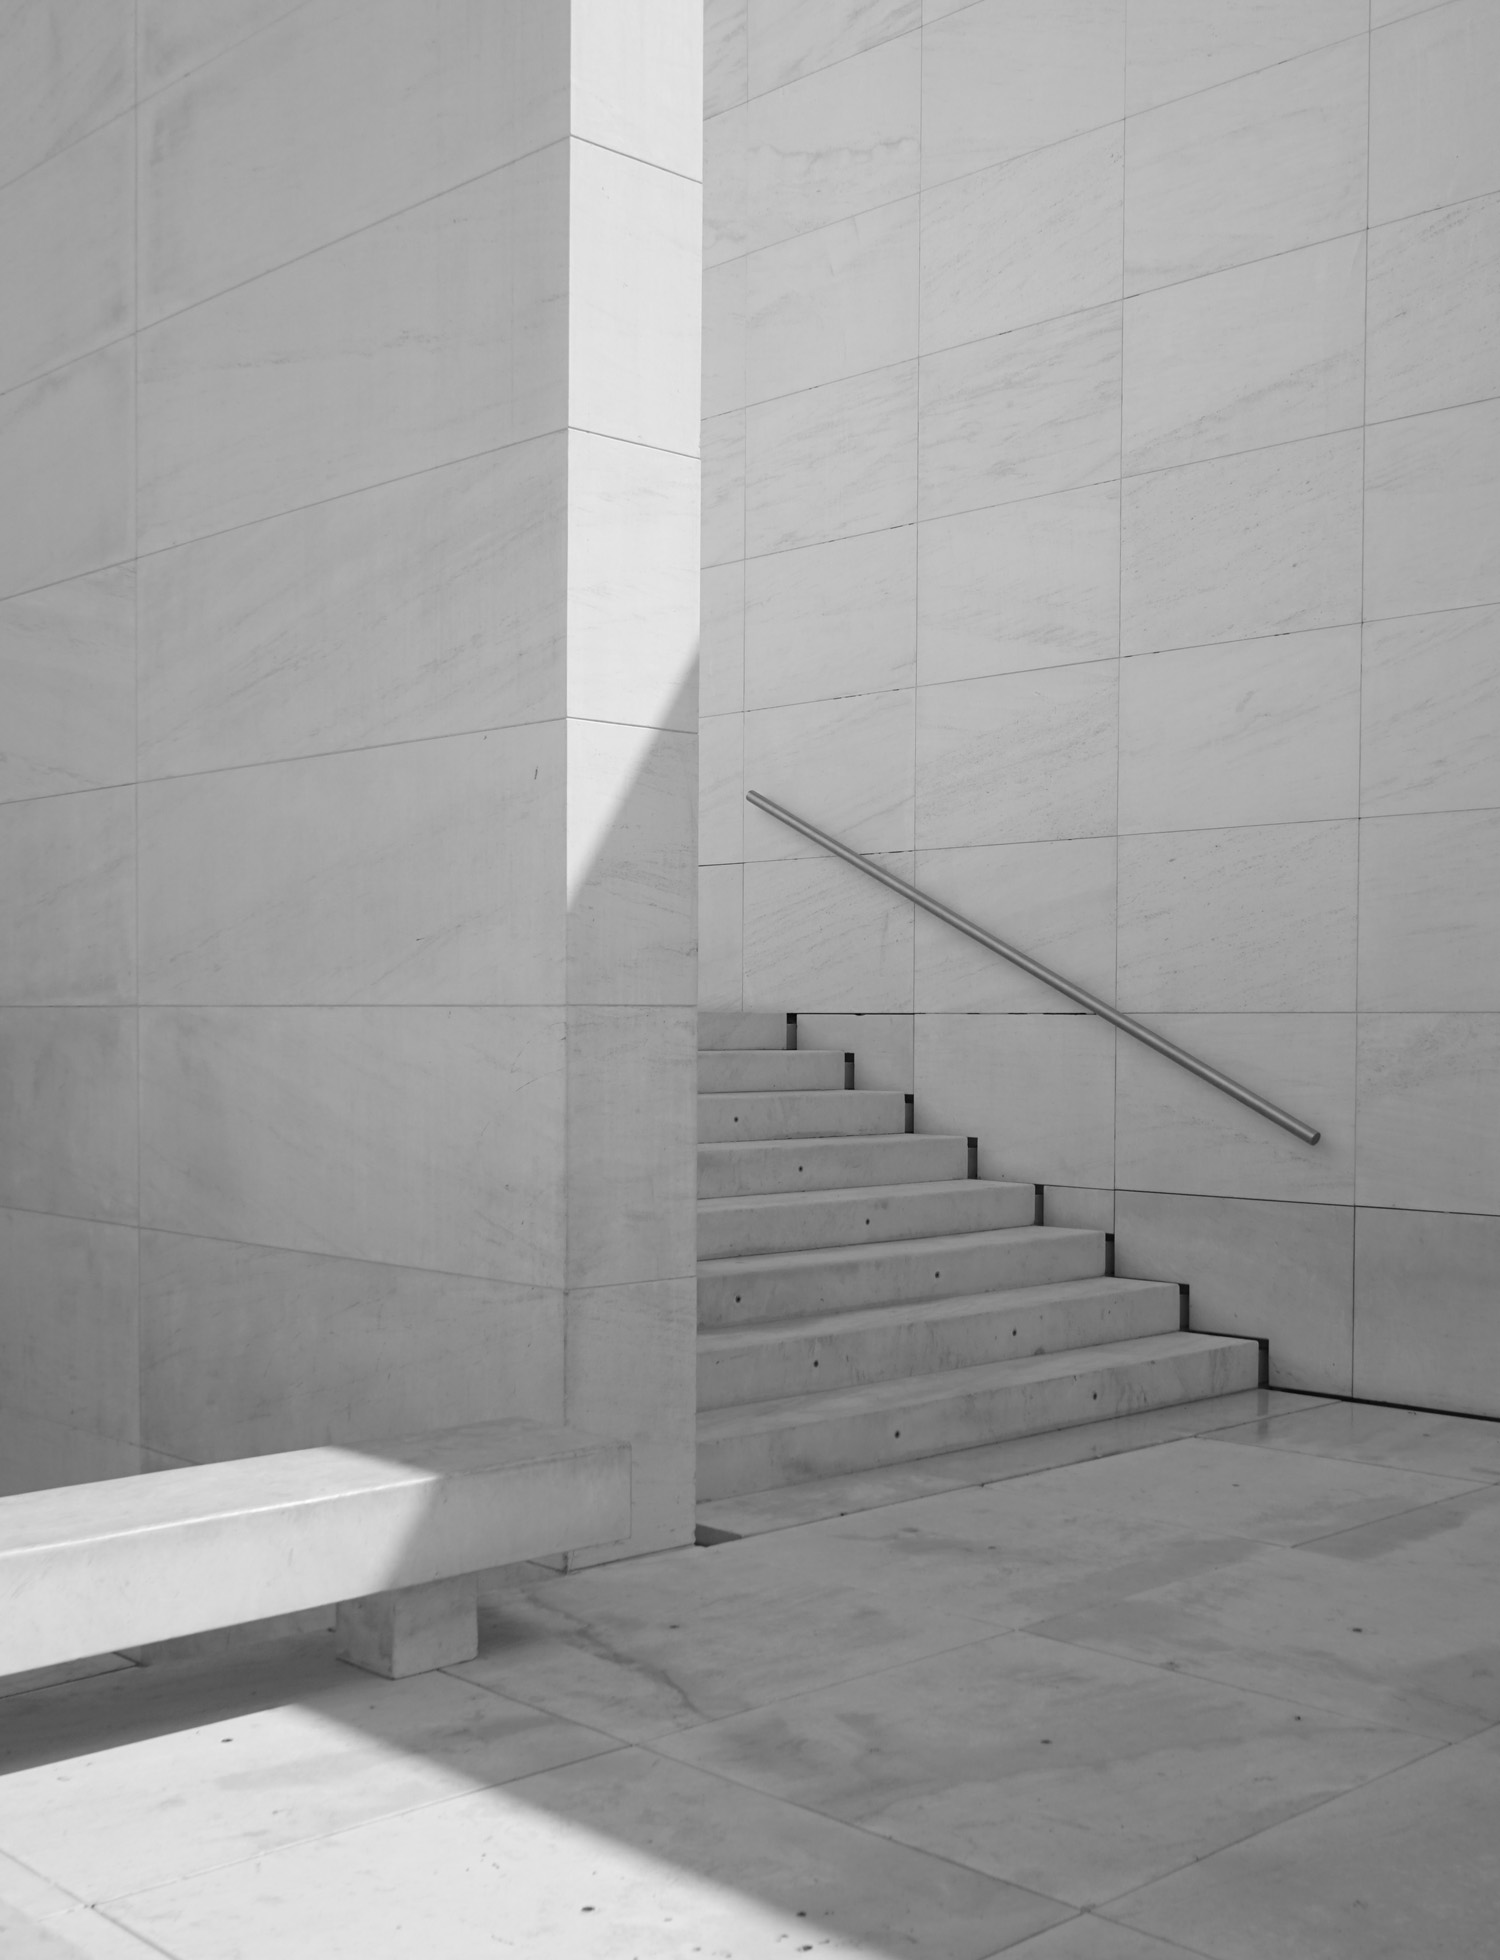 Emily-Grundon_architecture_spaces_0029.jpg